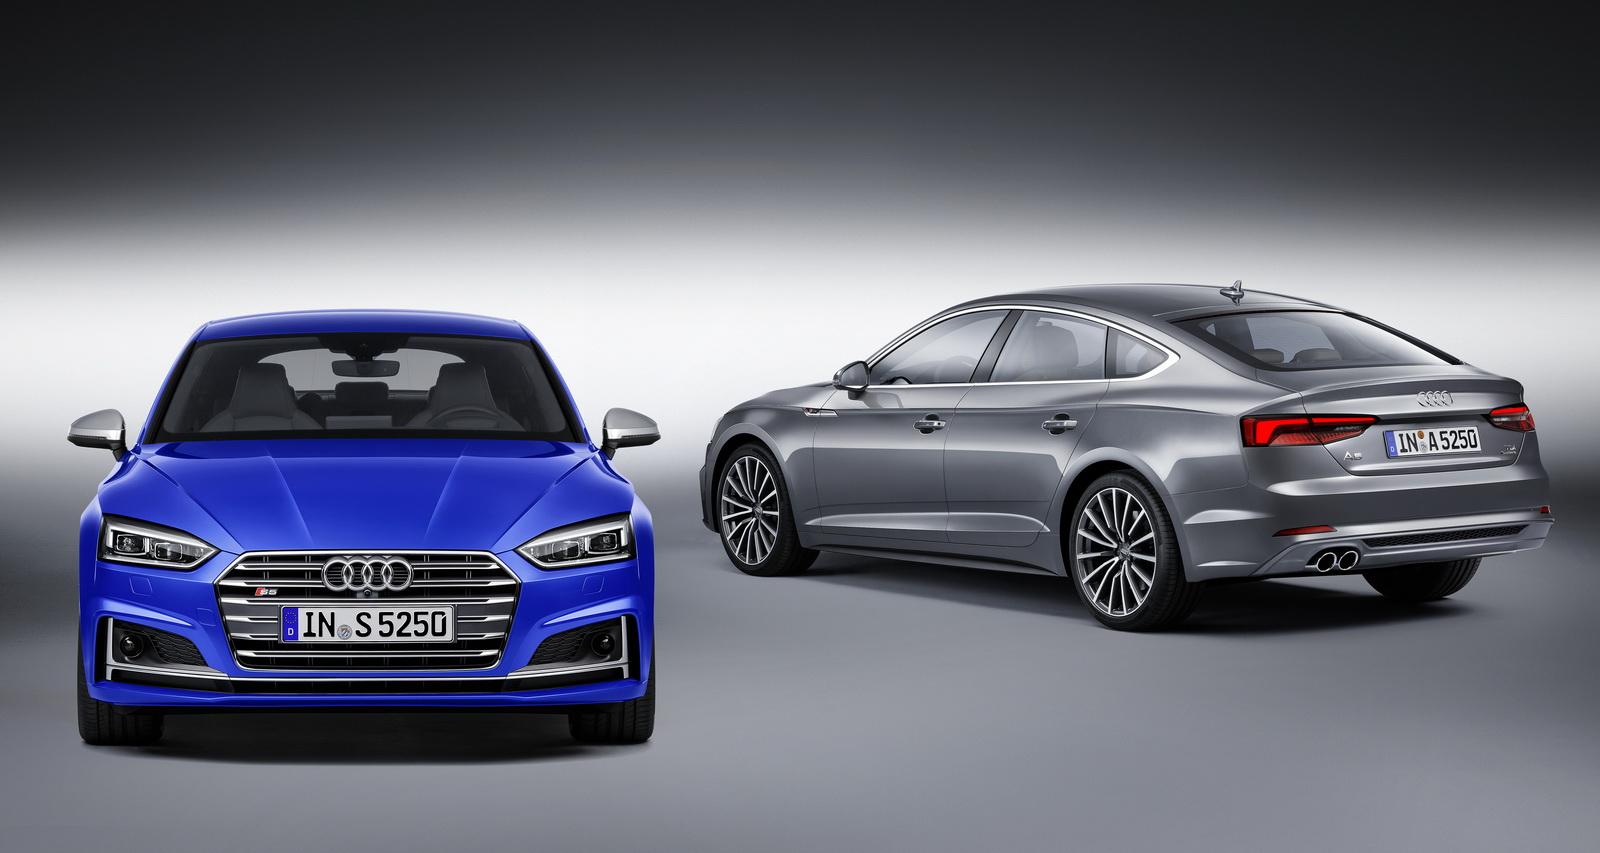 Audi представляет новое поколение A5 Sportback и S5 Sportback